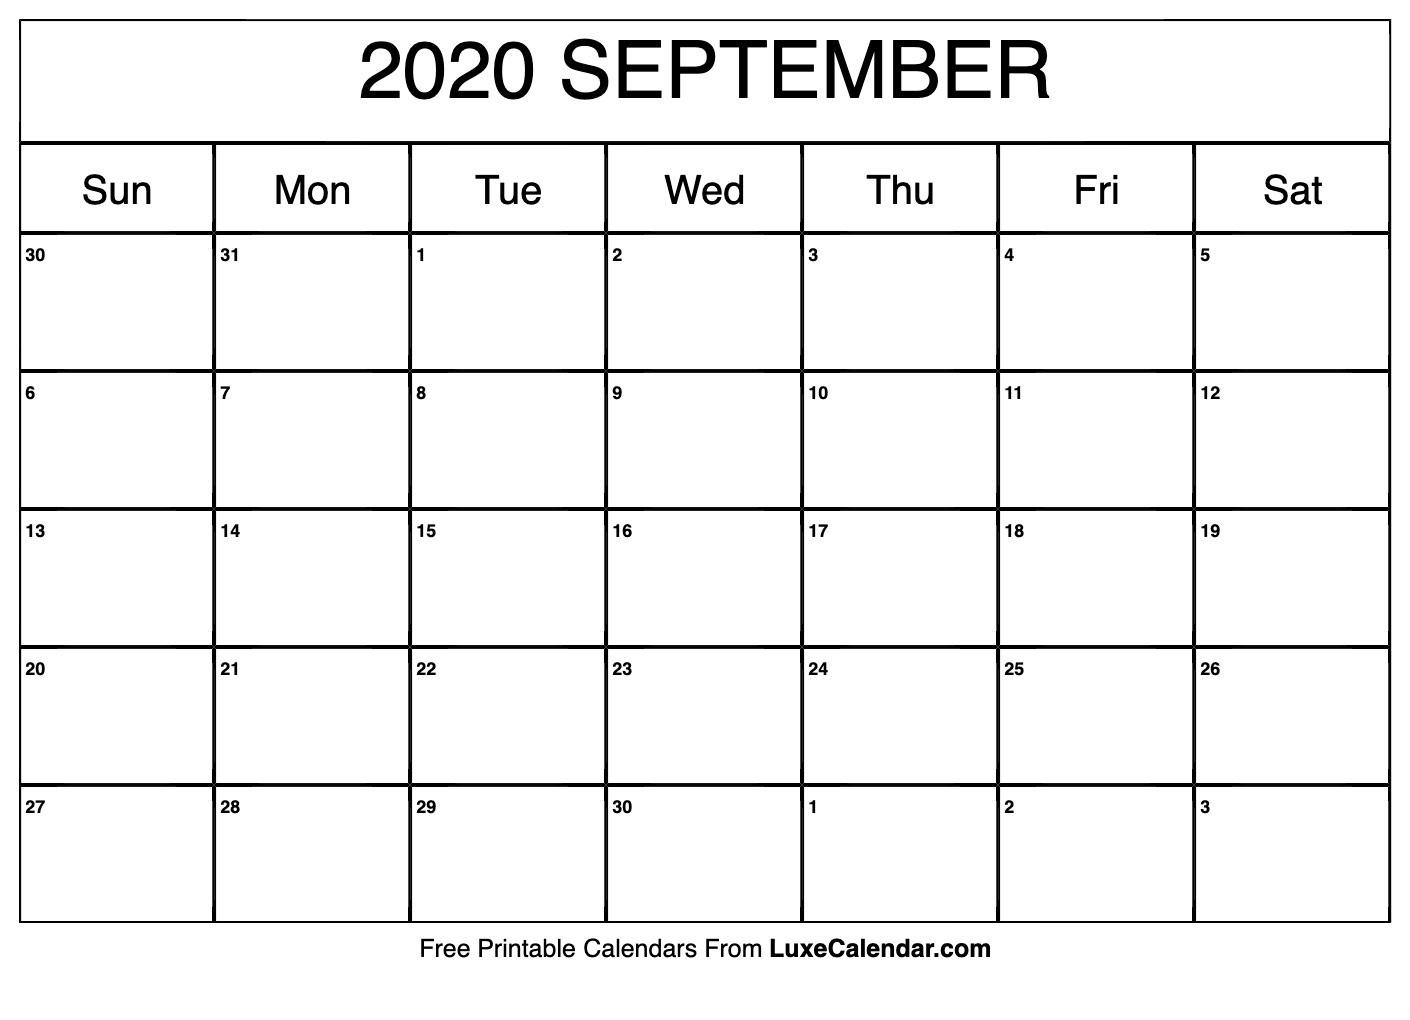 Blank September 2020 Calendar Printable - Luxe Calendar  Blank September Calendar 2020 Monday Through Sunday